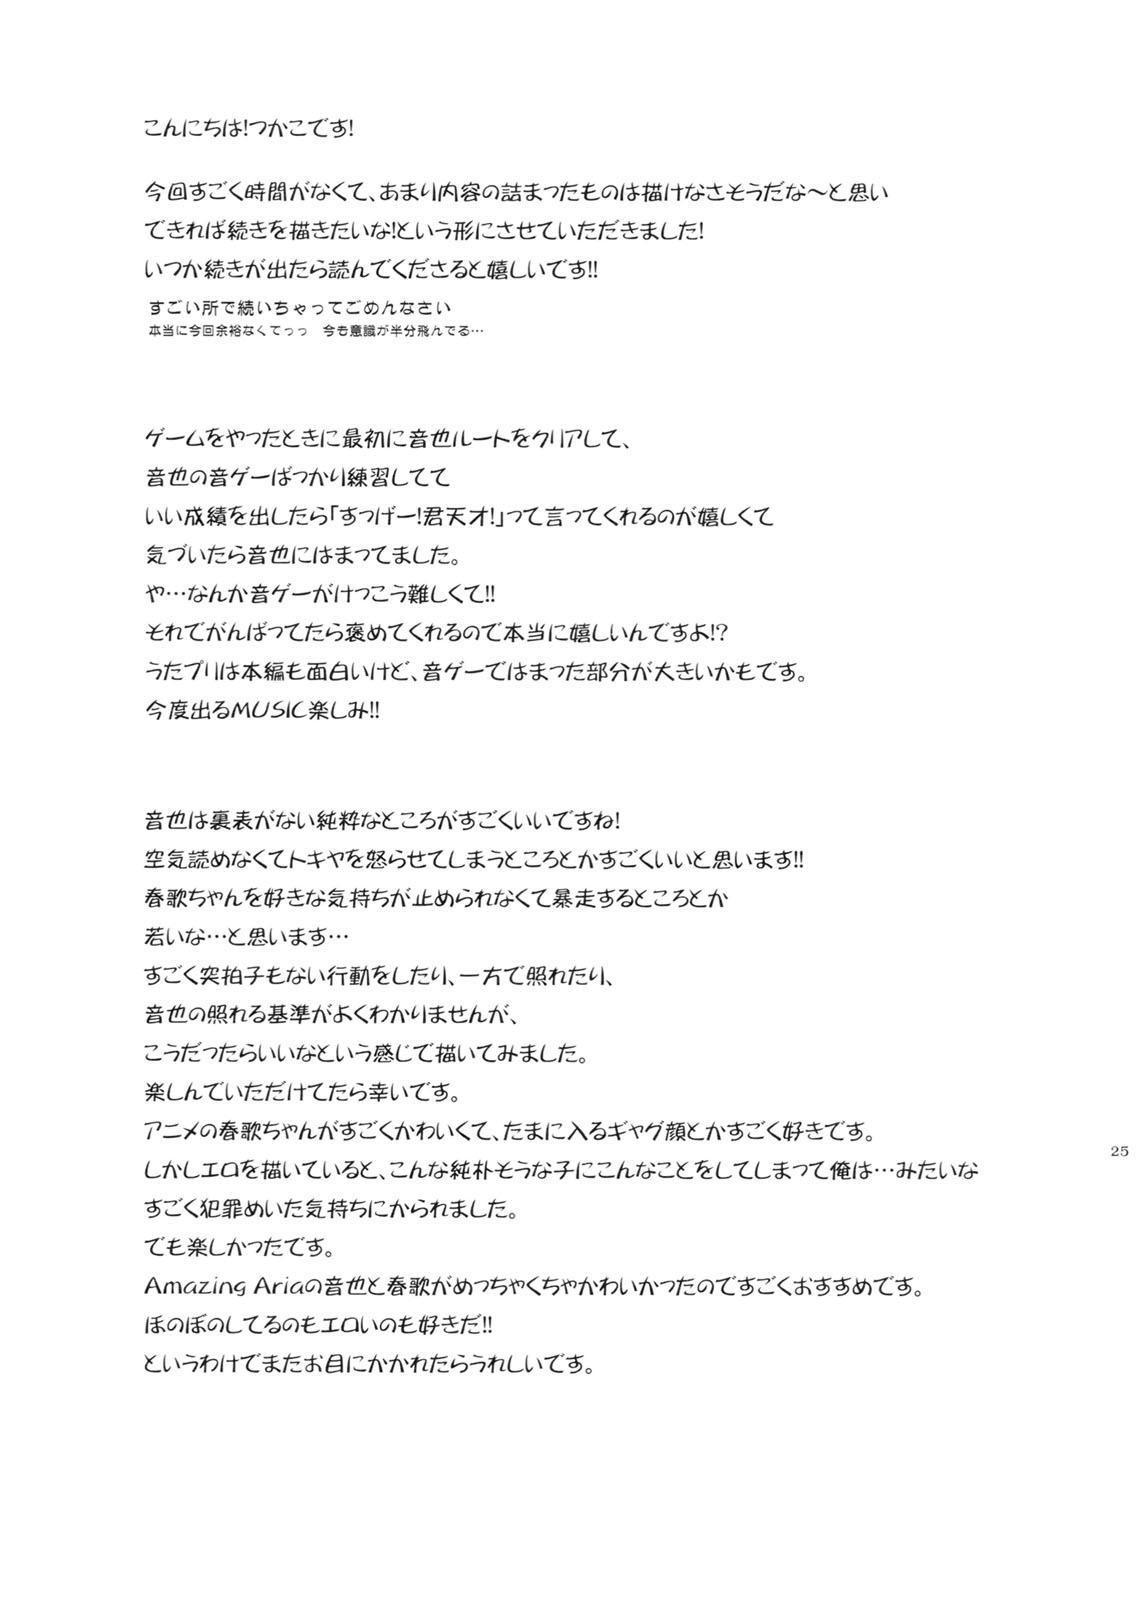 evergreen + Omake 23